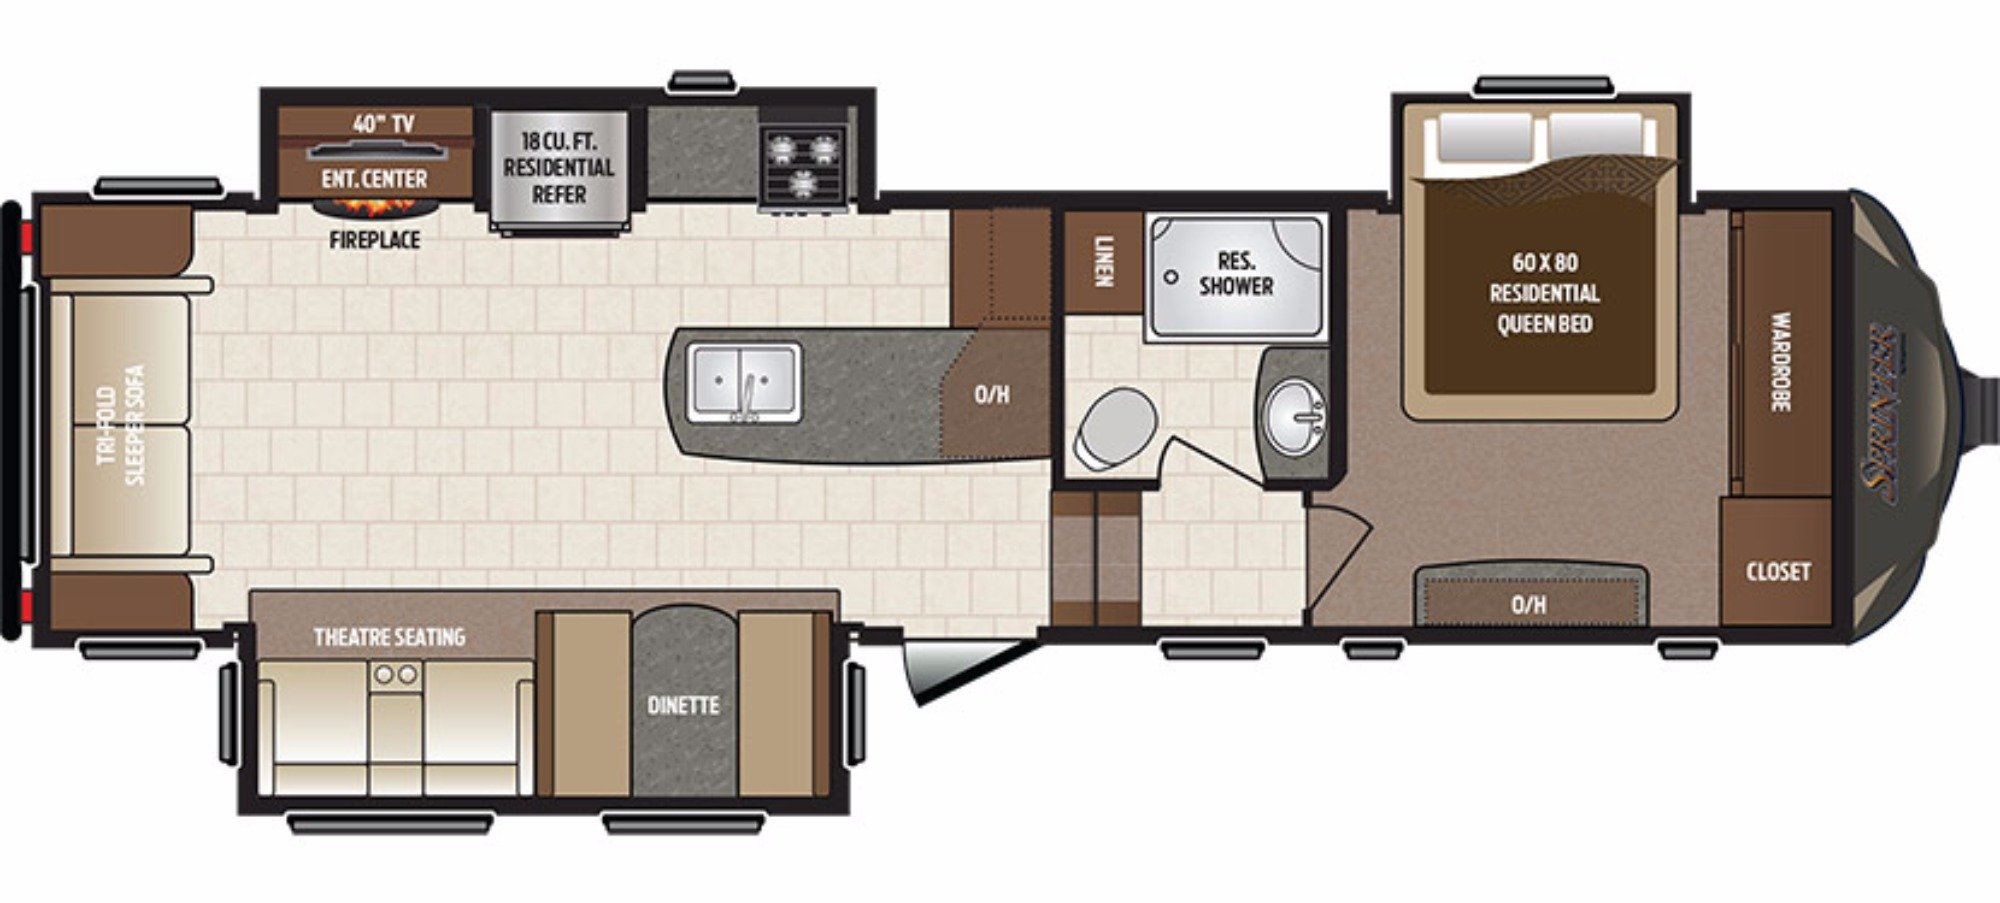 View Floor Plan for 2017 KEYSTONE SPRINTER 298FWRLS